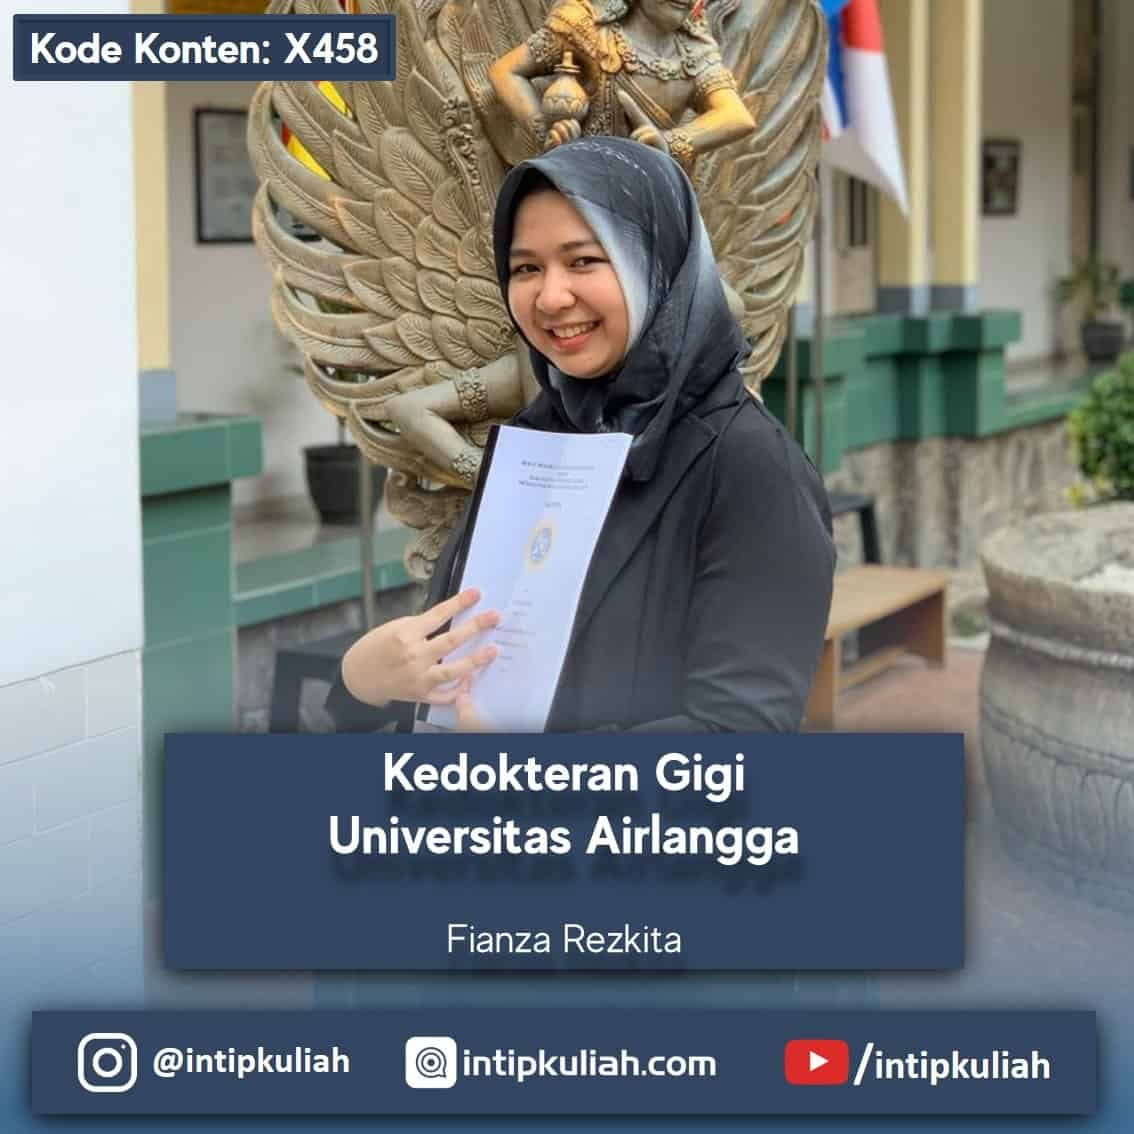 Kedokteran Gigi Universitas Airlangga (Fianza)